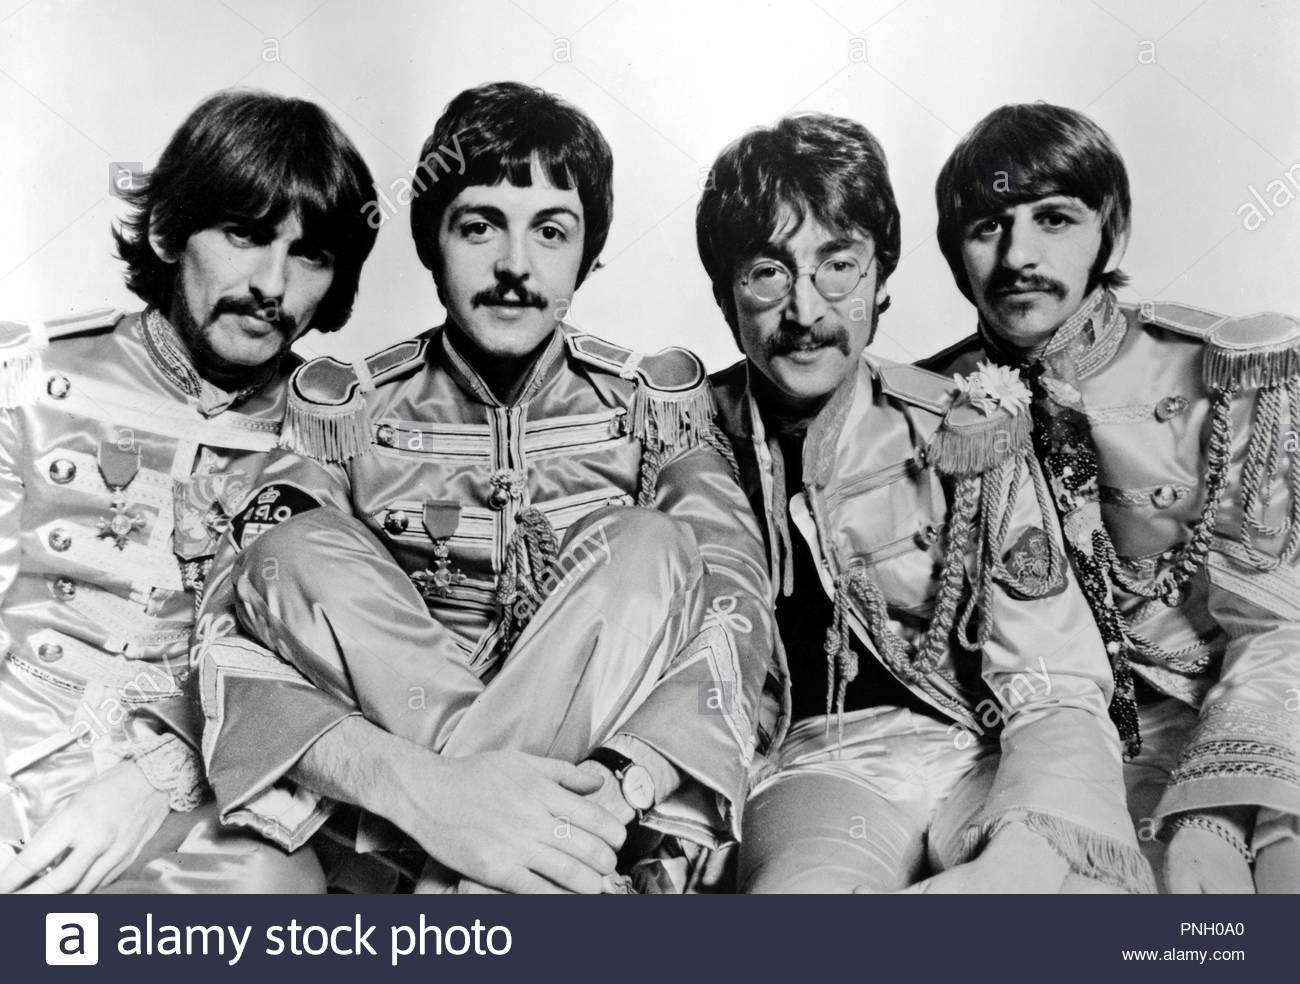 THE BEATLES; RINGO STARR; GEORGE HARRISON; PAUL MACCARTNEY; JOHN LENNON. - Stock Image